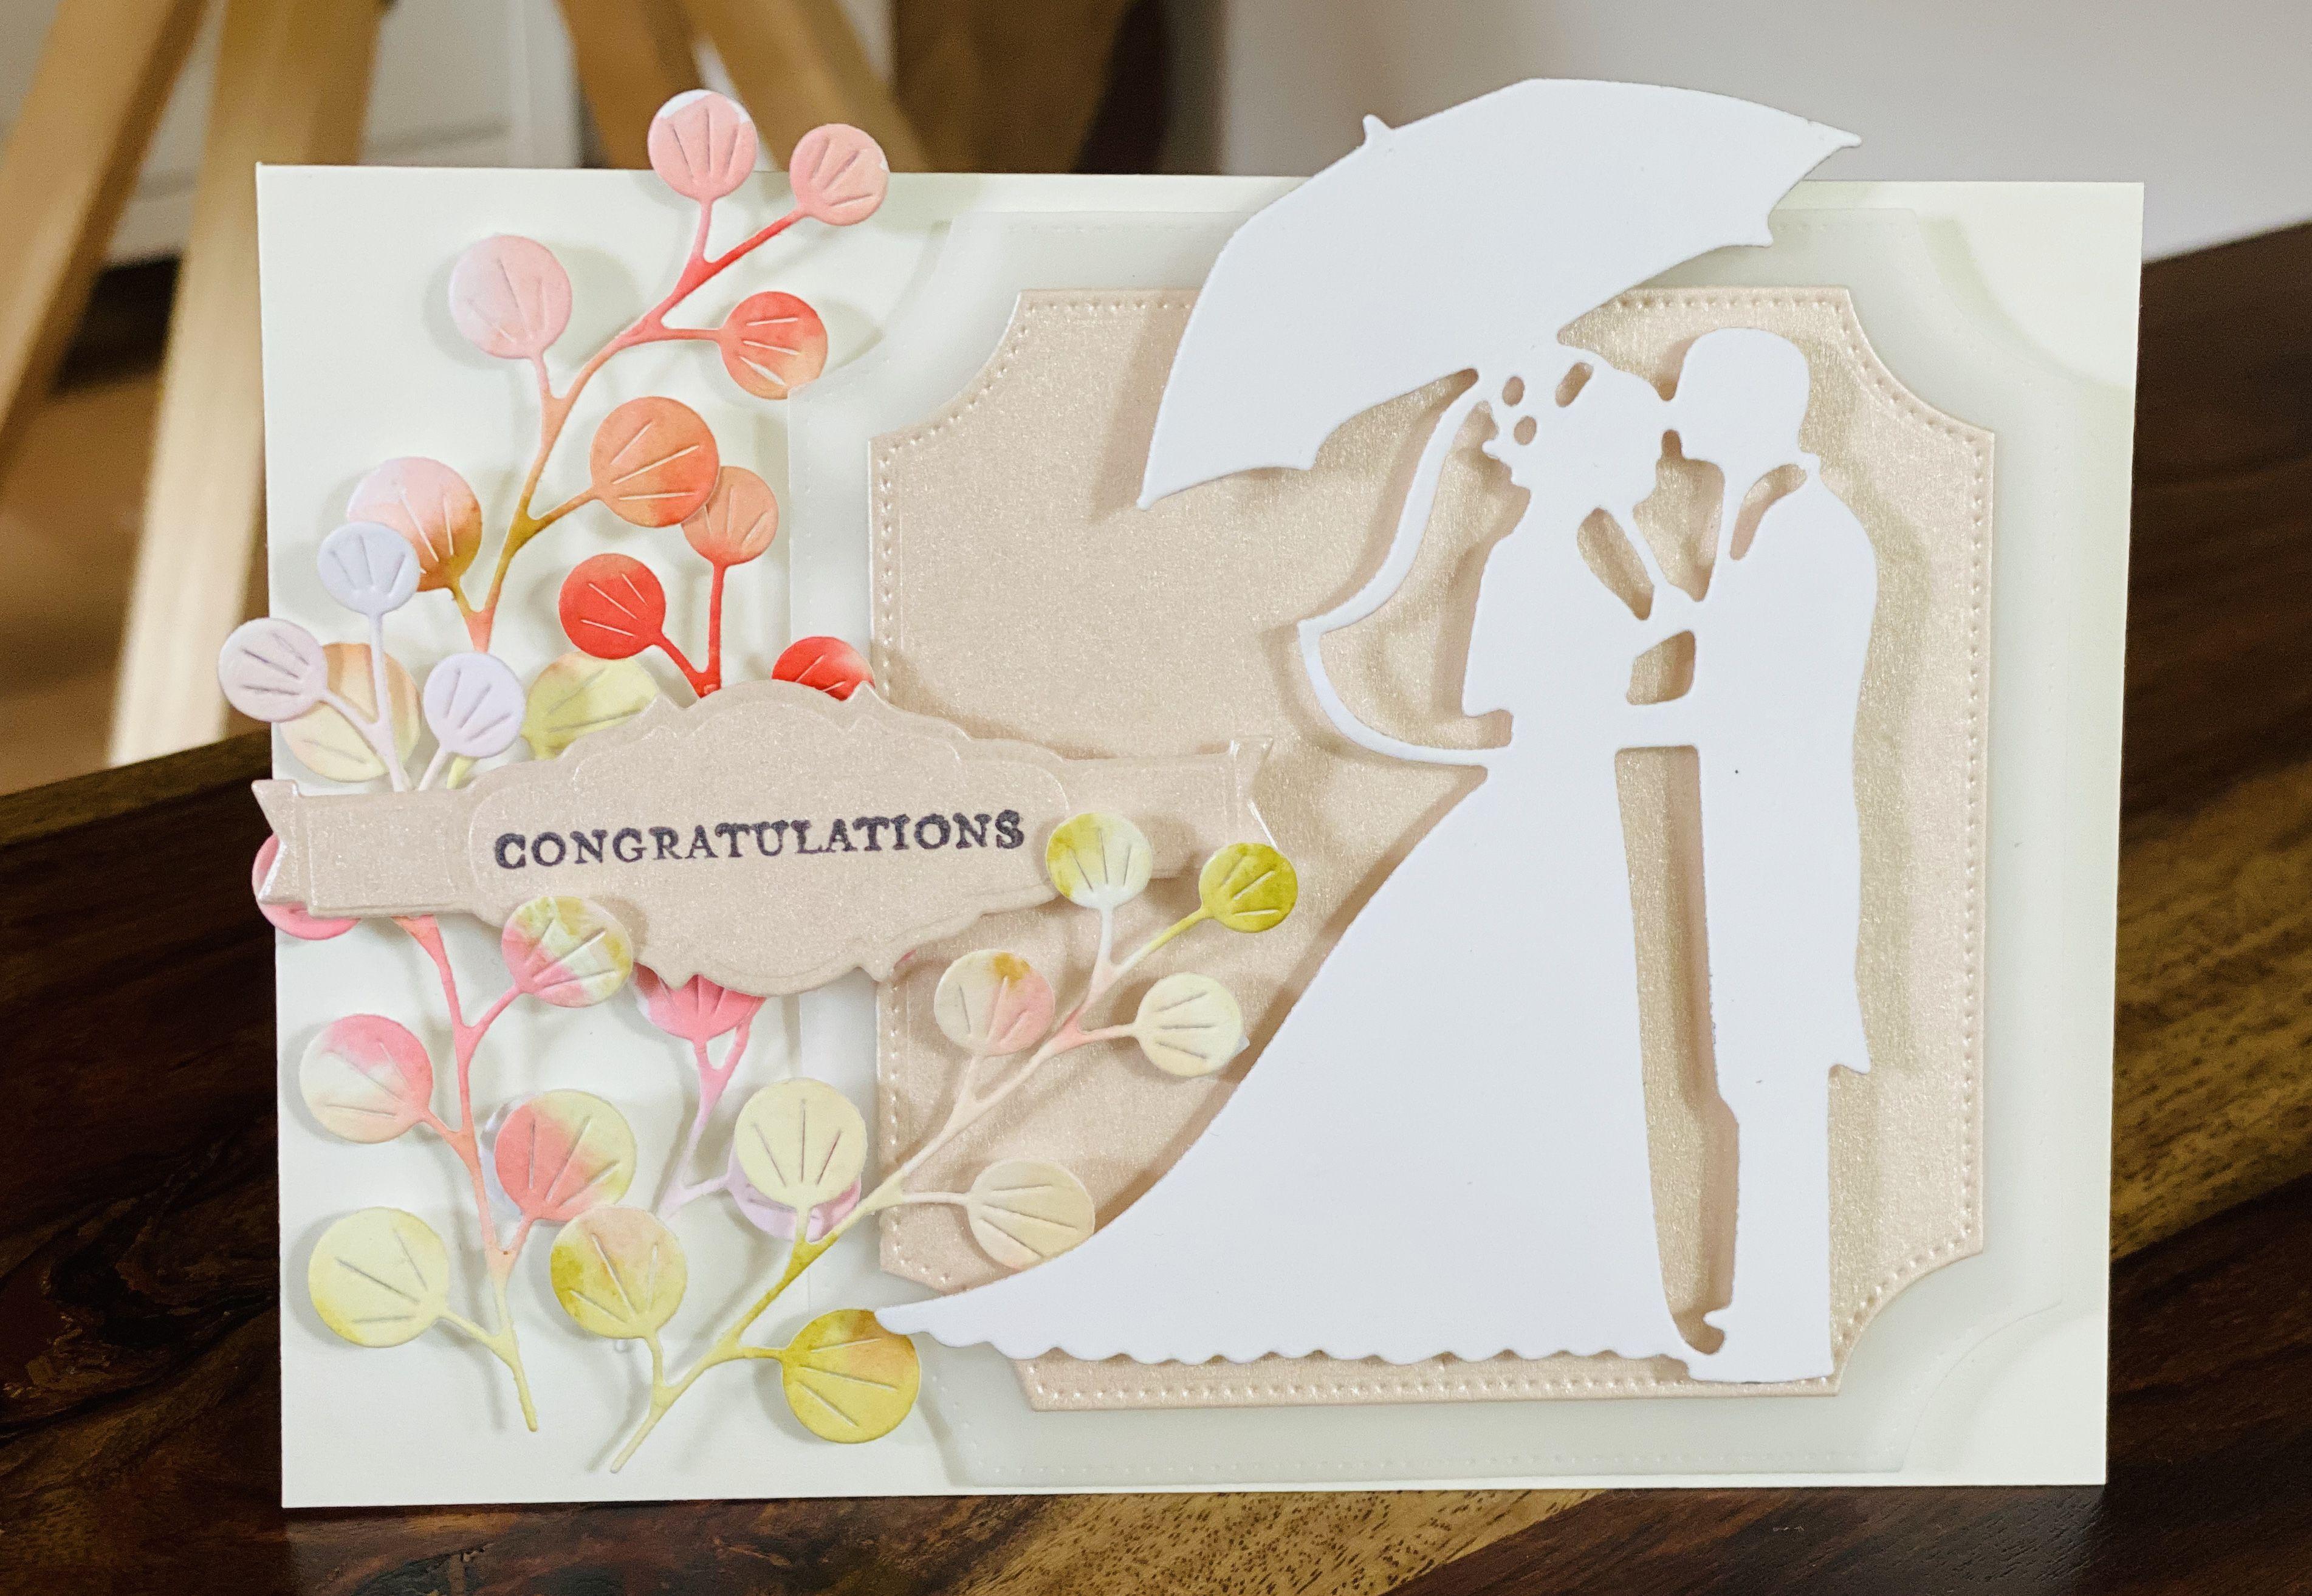 #diy #weddingcards #weddingcardideas #loveisintheair #lovecards #hochzeitskarten #brautpaar #diy #diycards #diycardhandmade